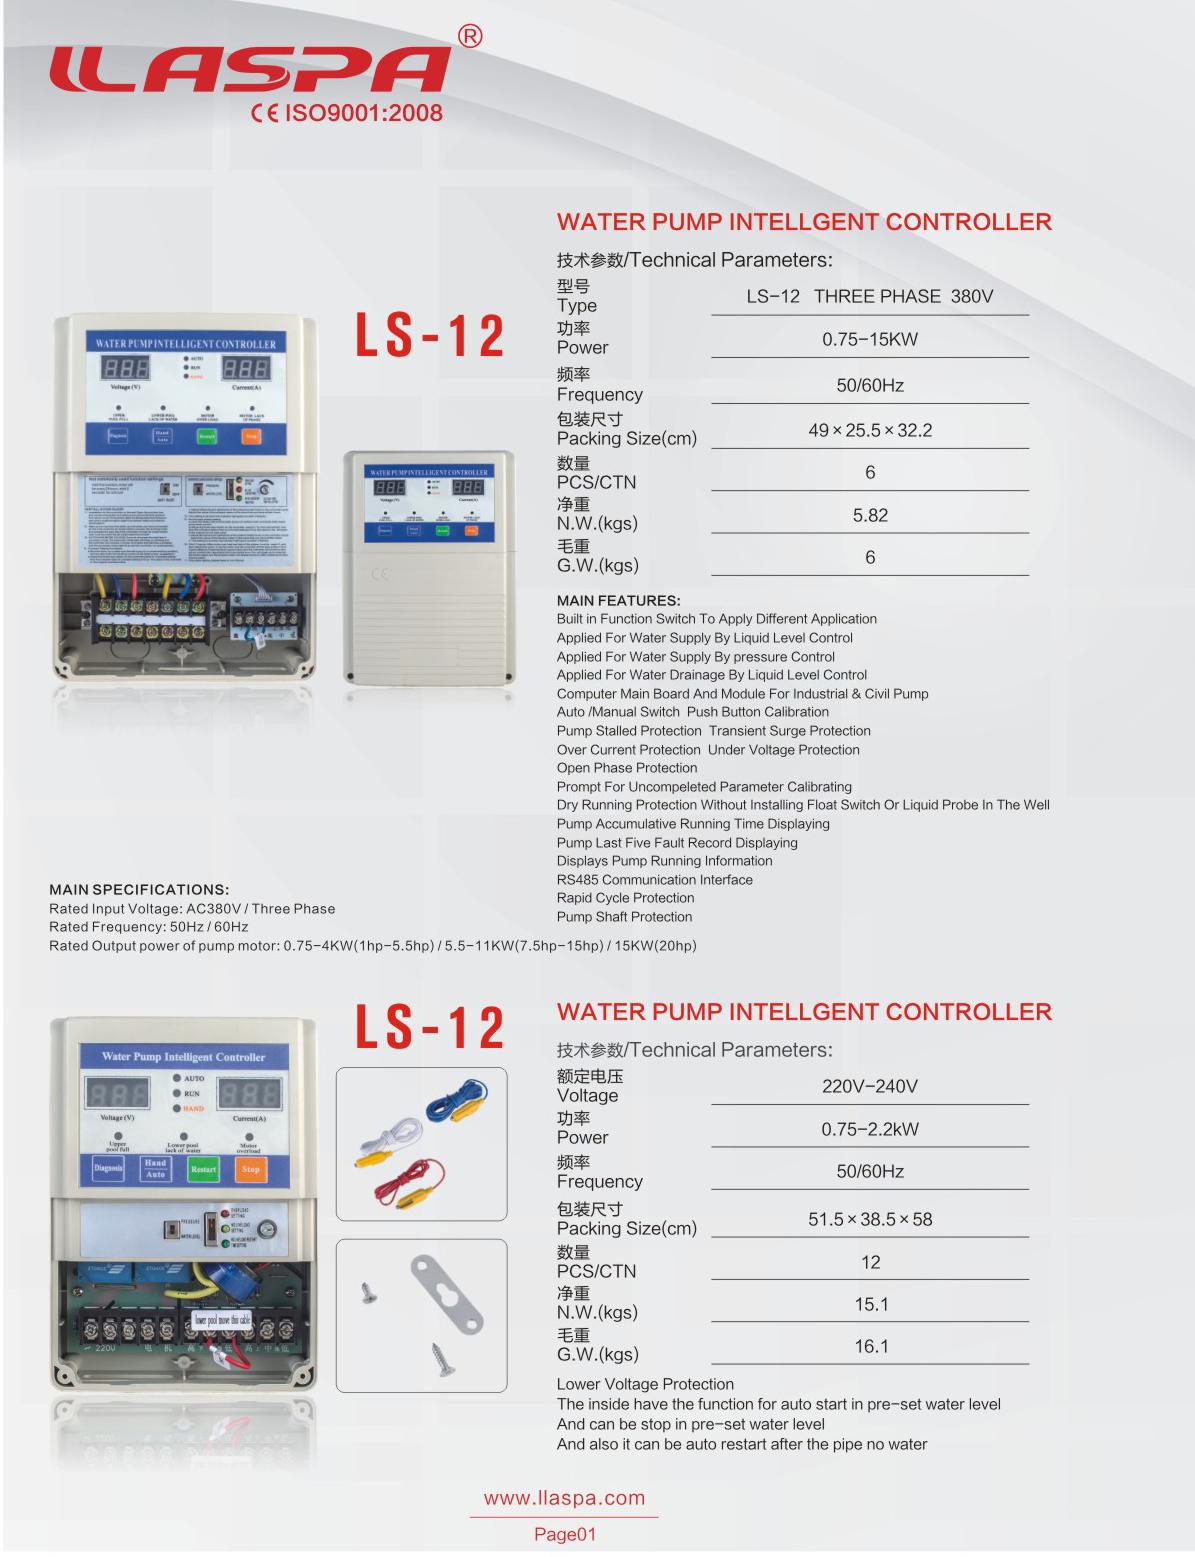 Smart water pump control box for LS-12